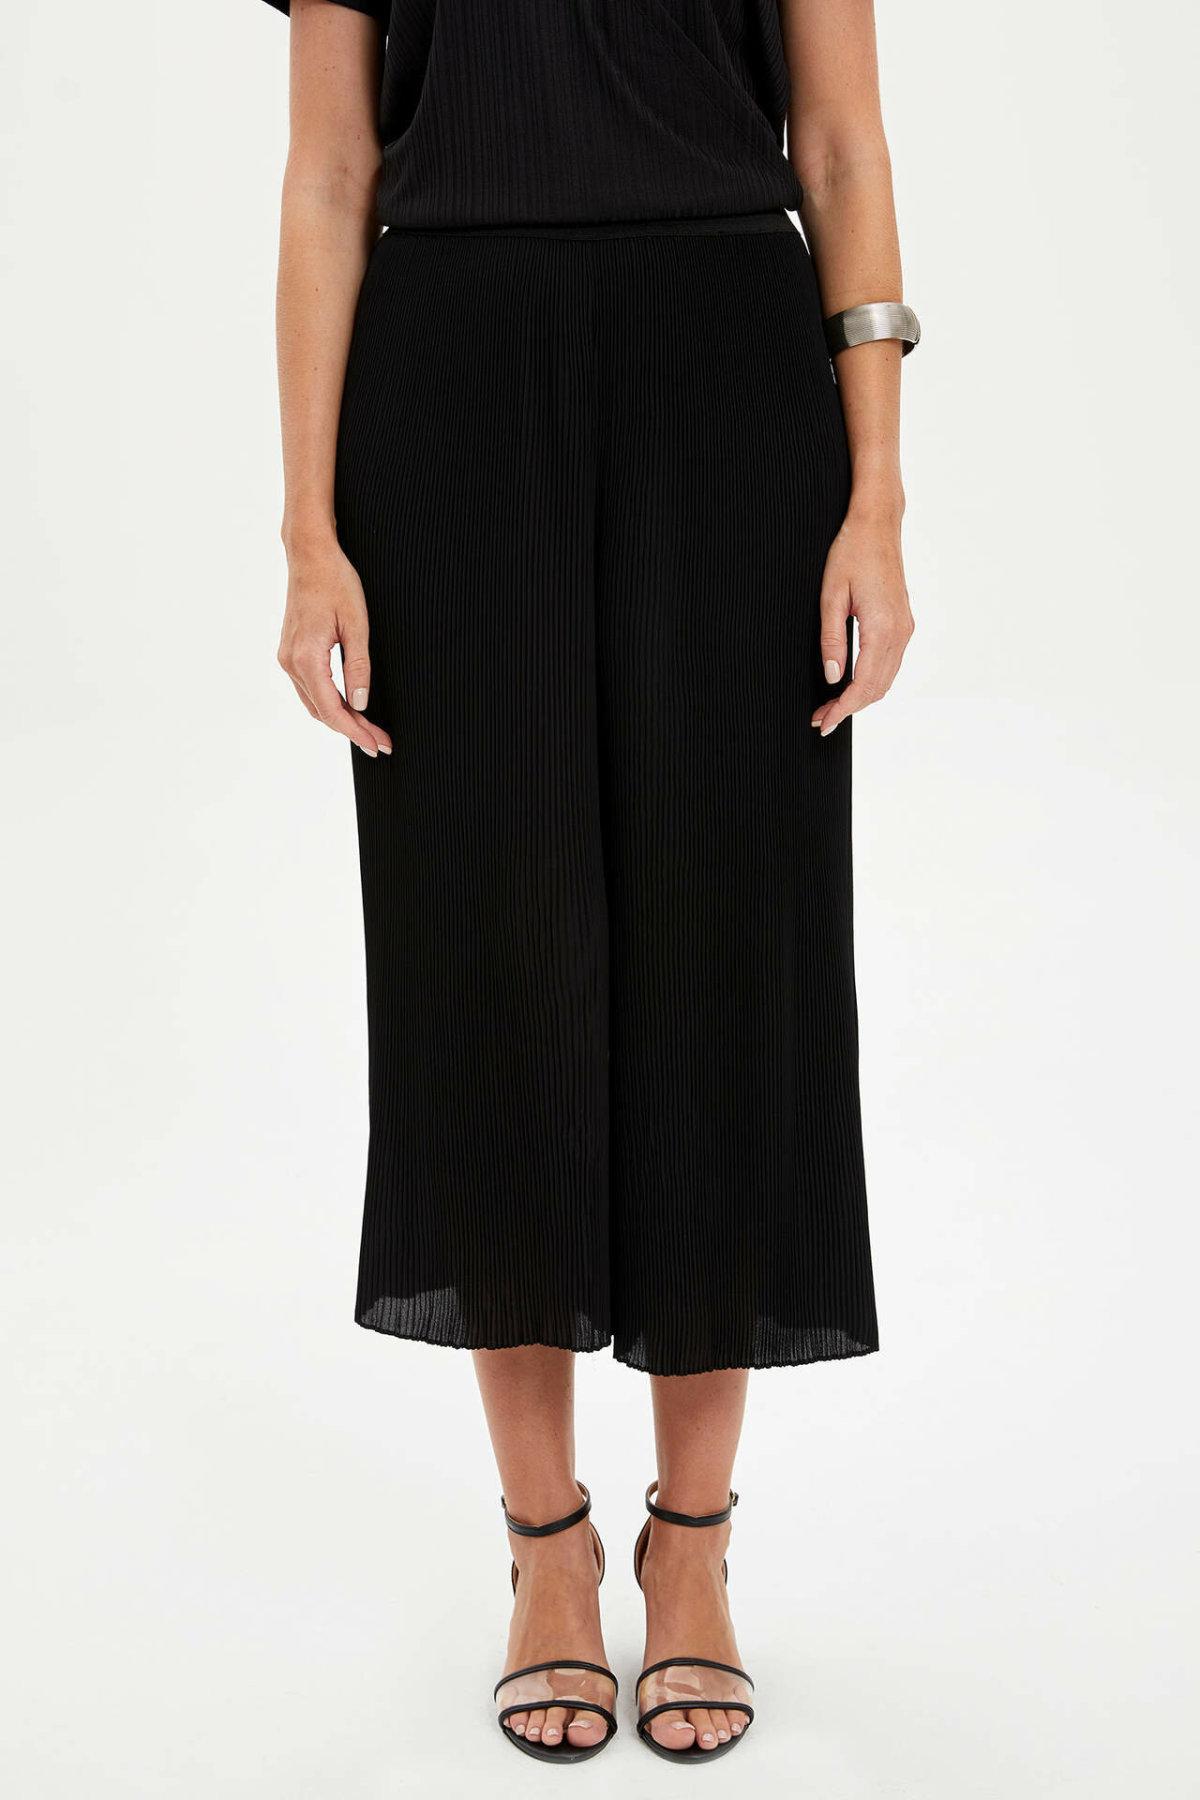 DeFacto Woman Summer Black Chiffon Long Bottoms Women Casual Elastic Bottoms Female Wide-leg Loose Capri-L7179AZ19SM